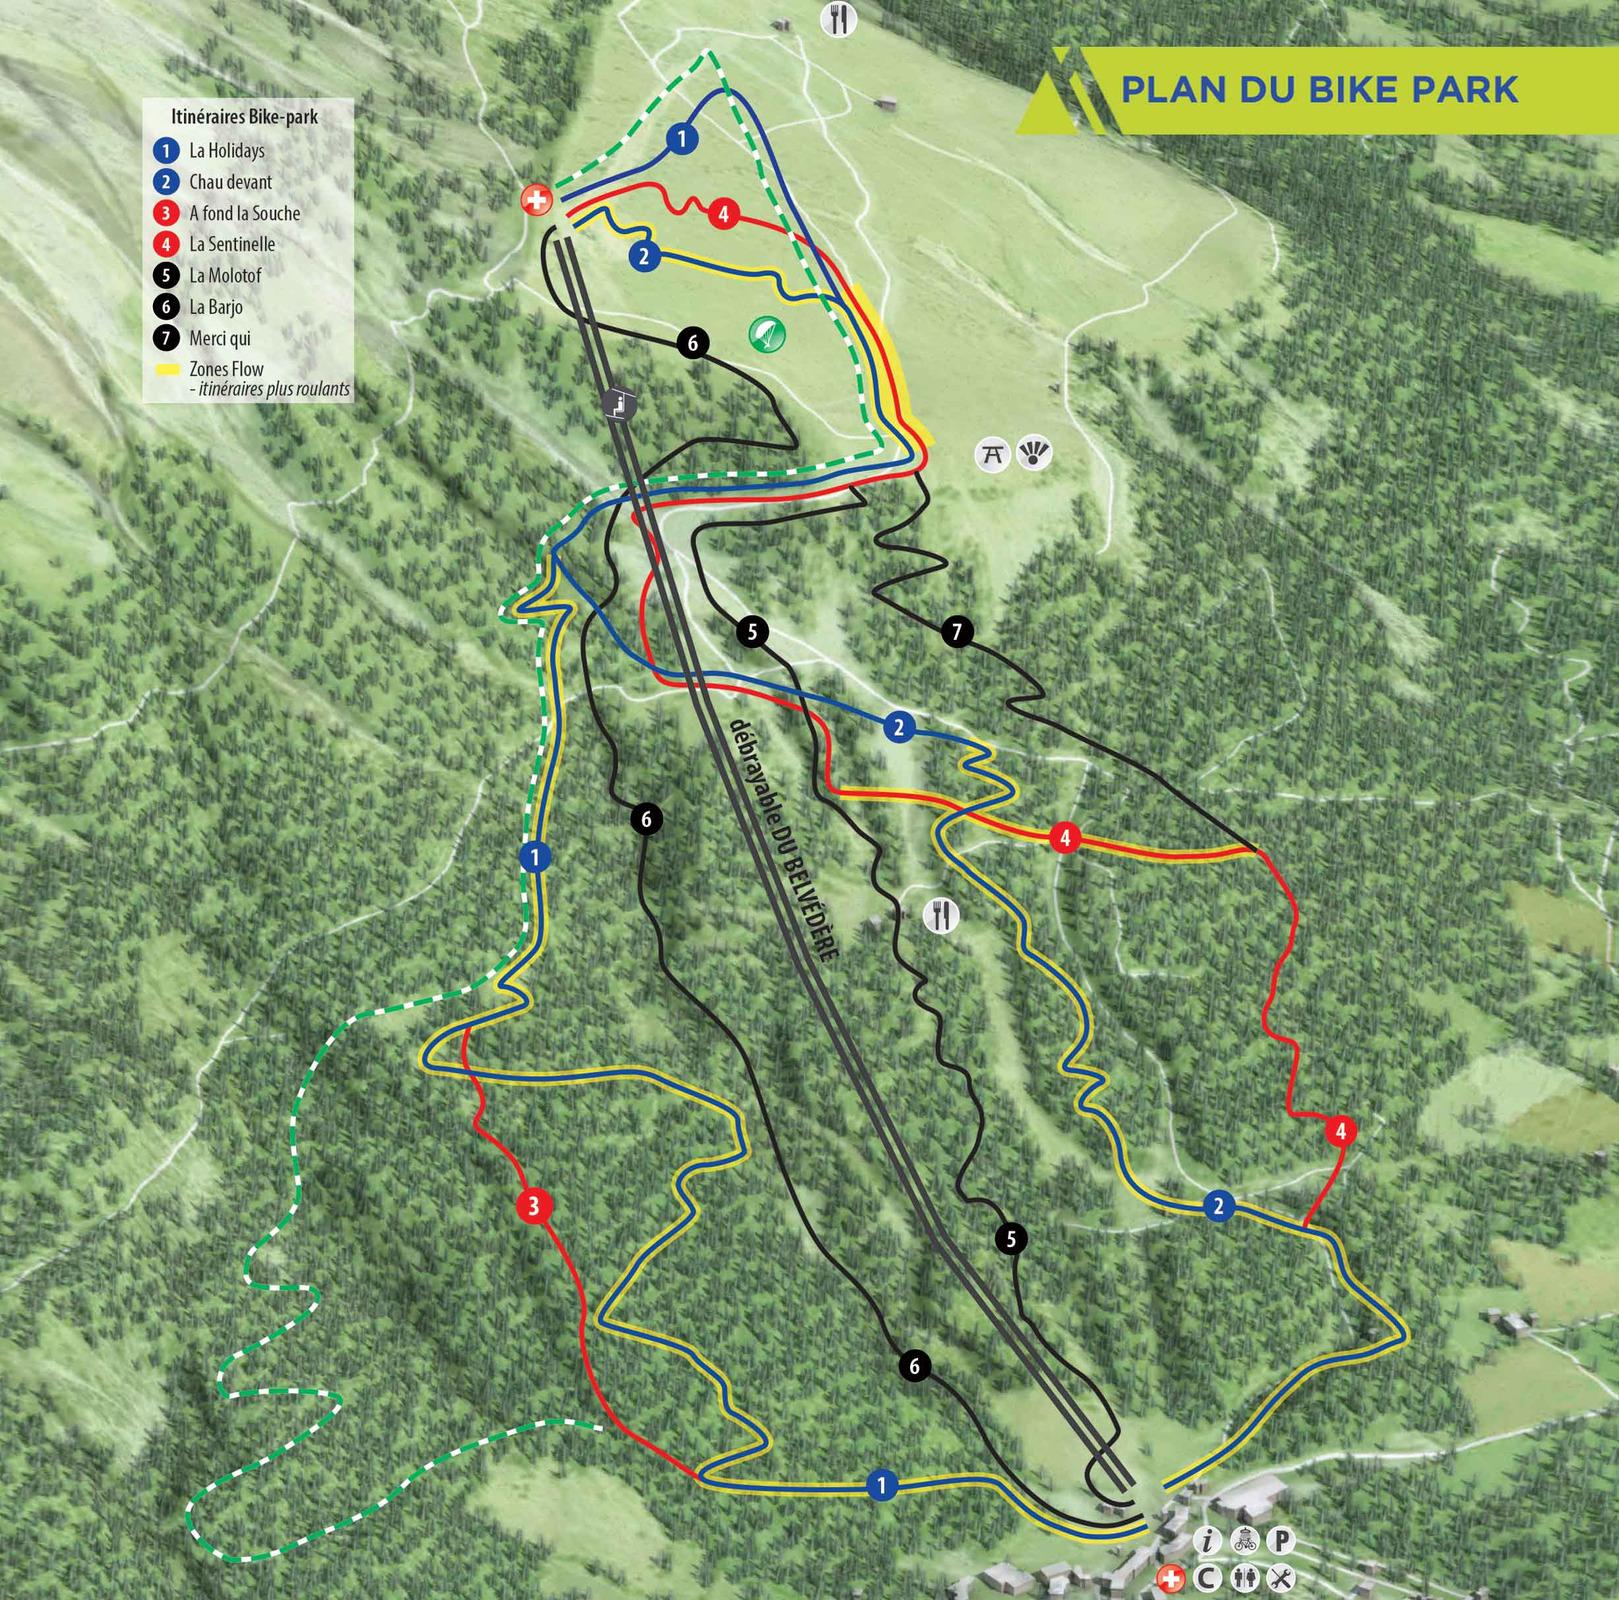 Montclar bikepark plan